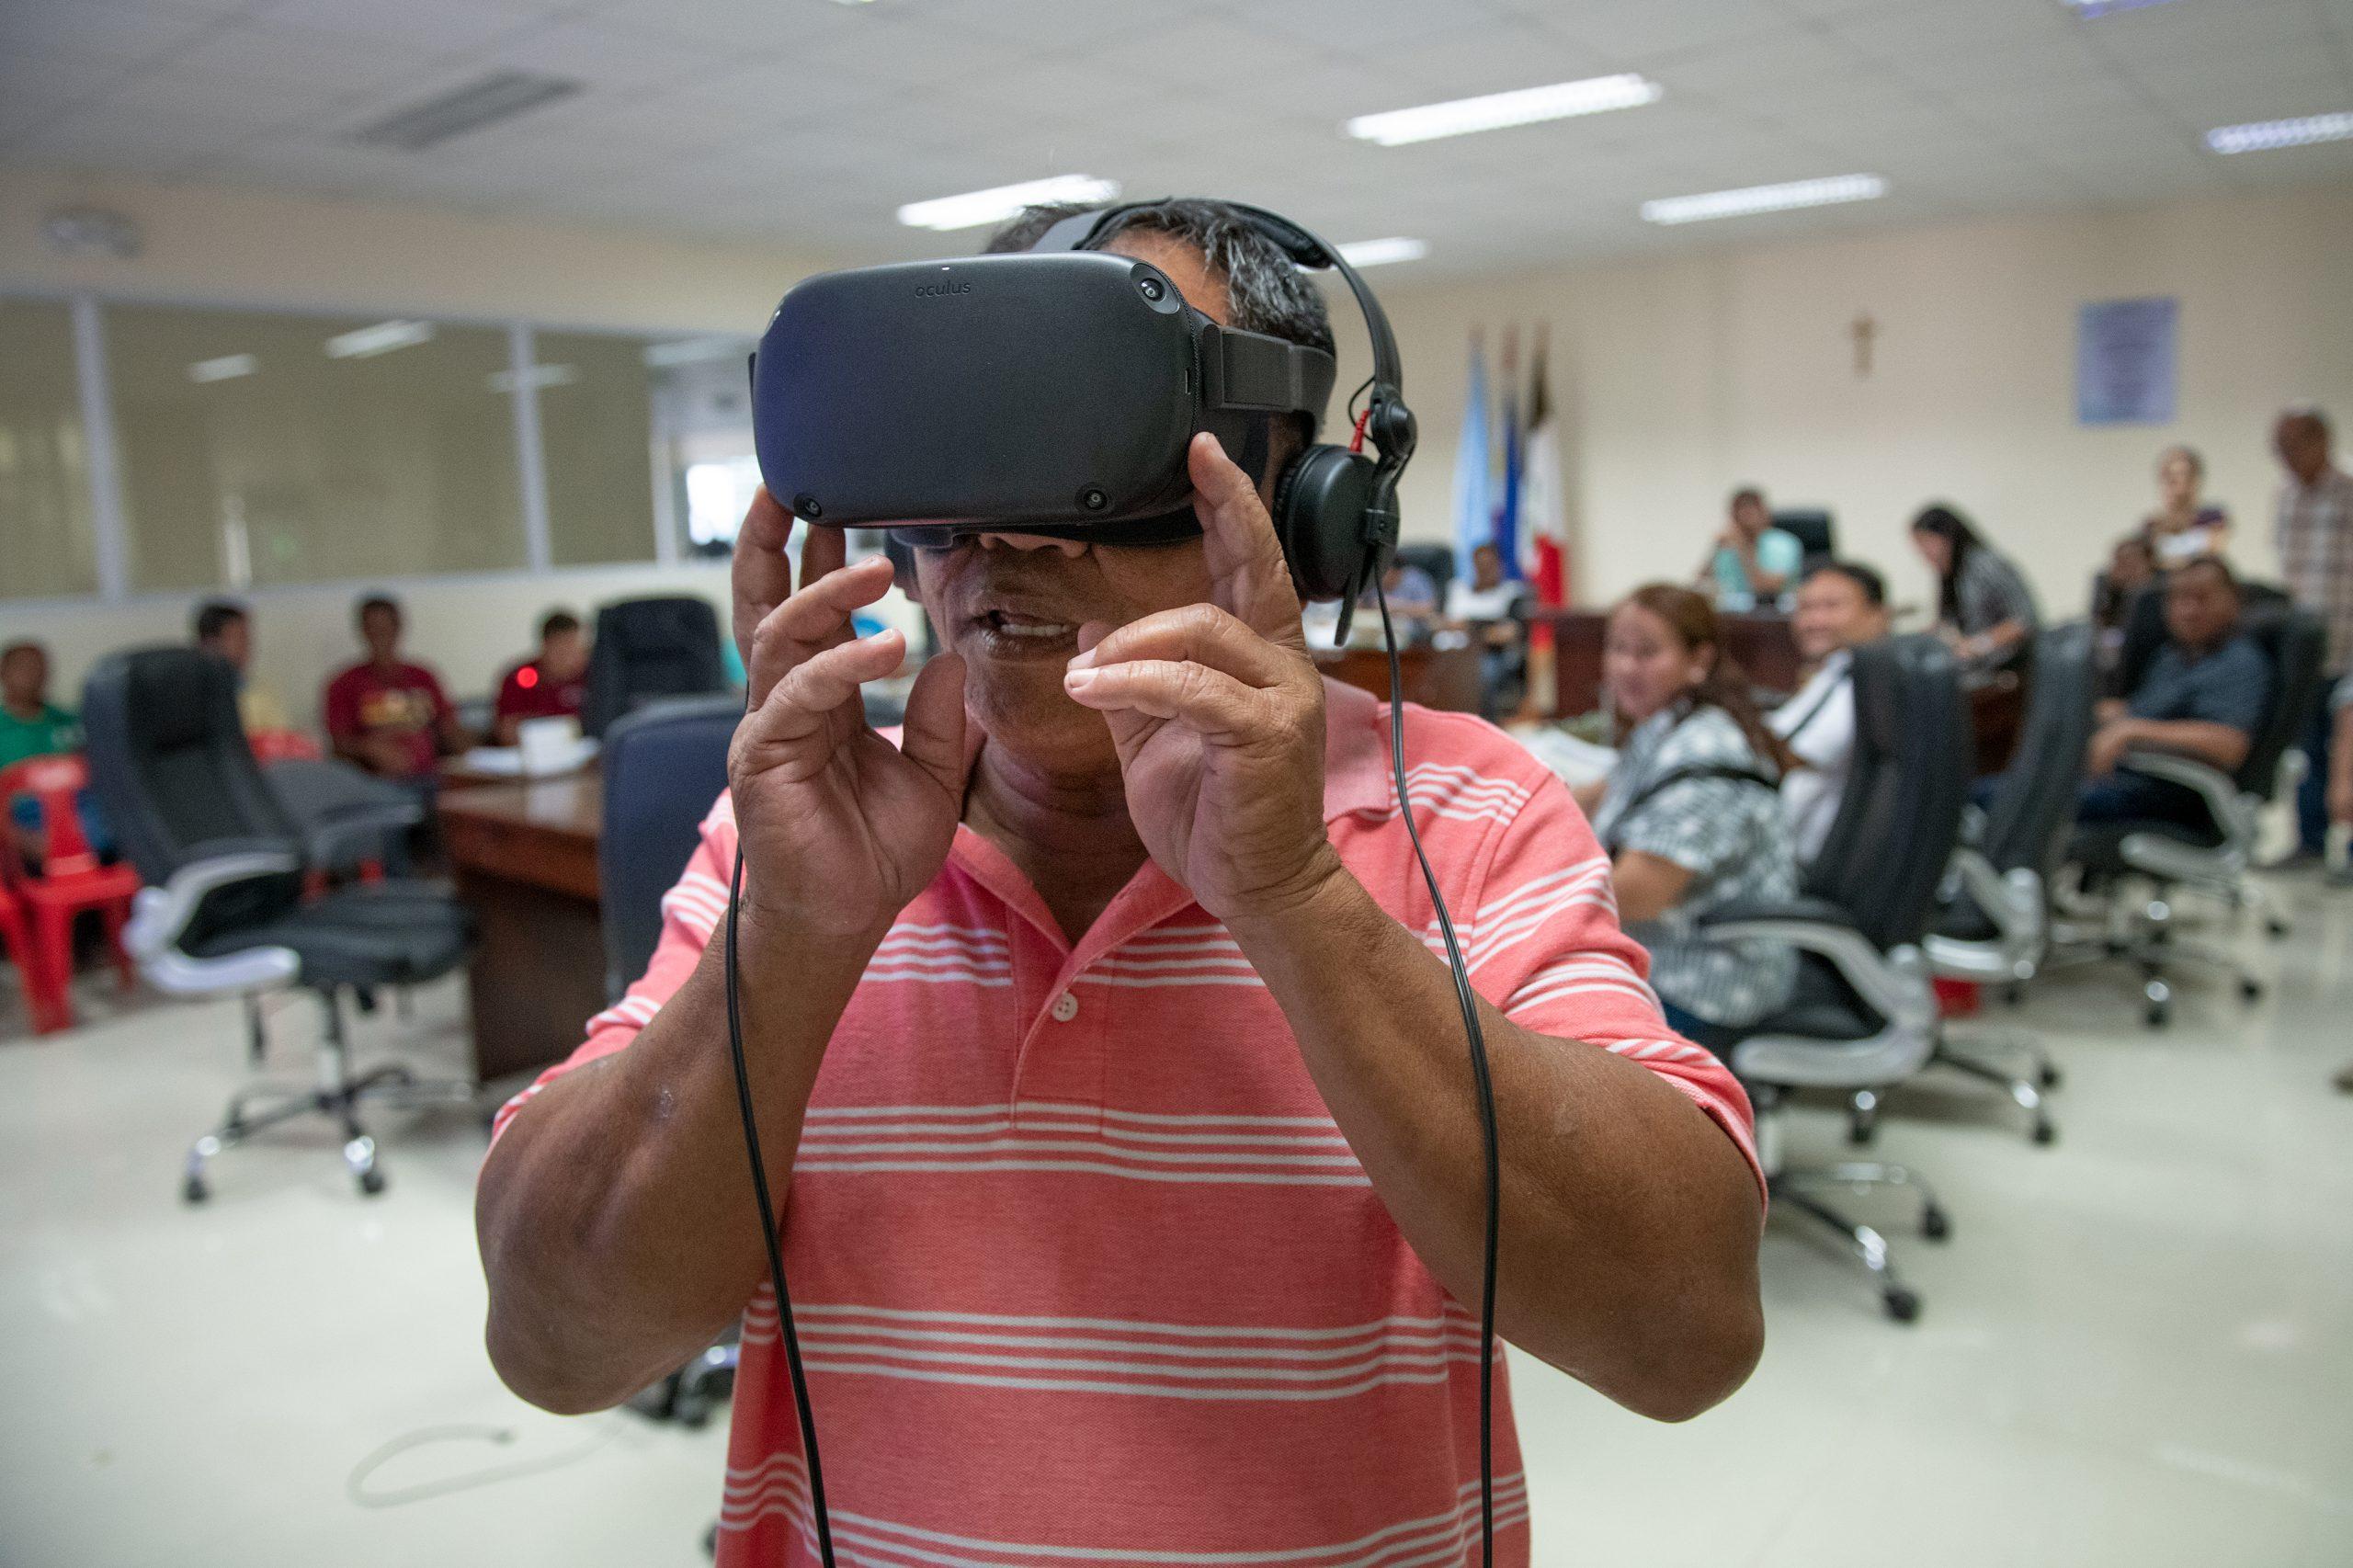 360VR Presentation